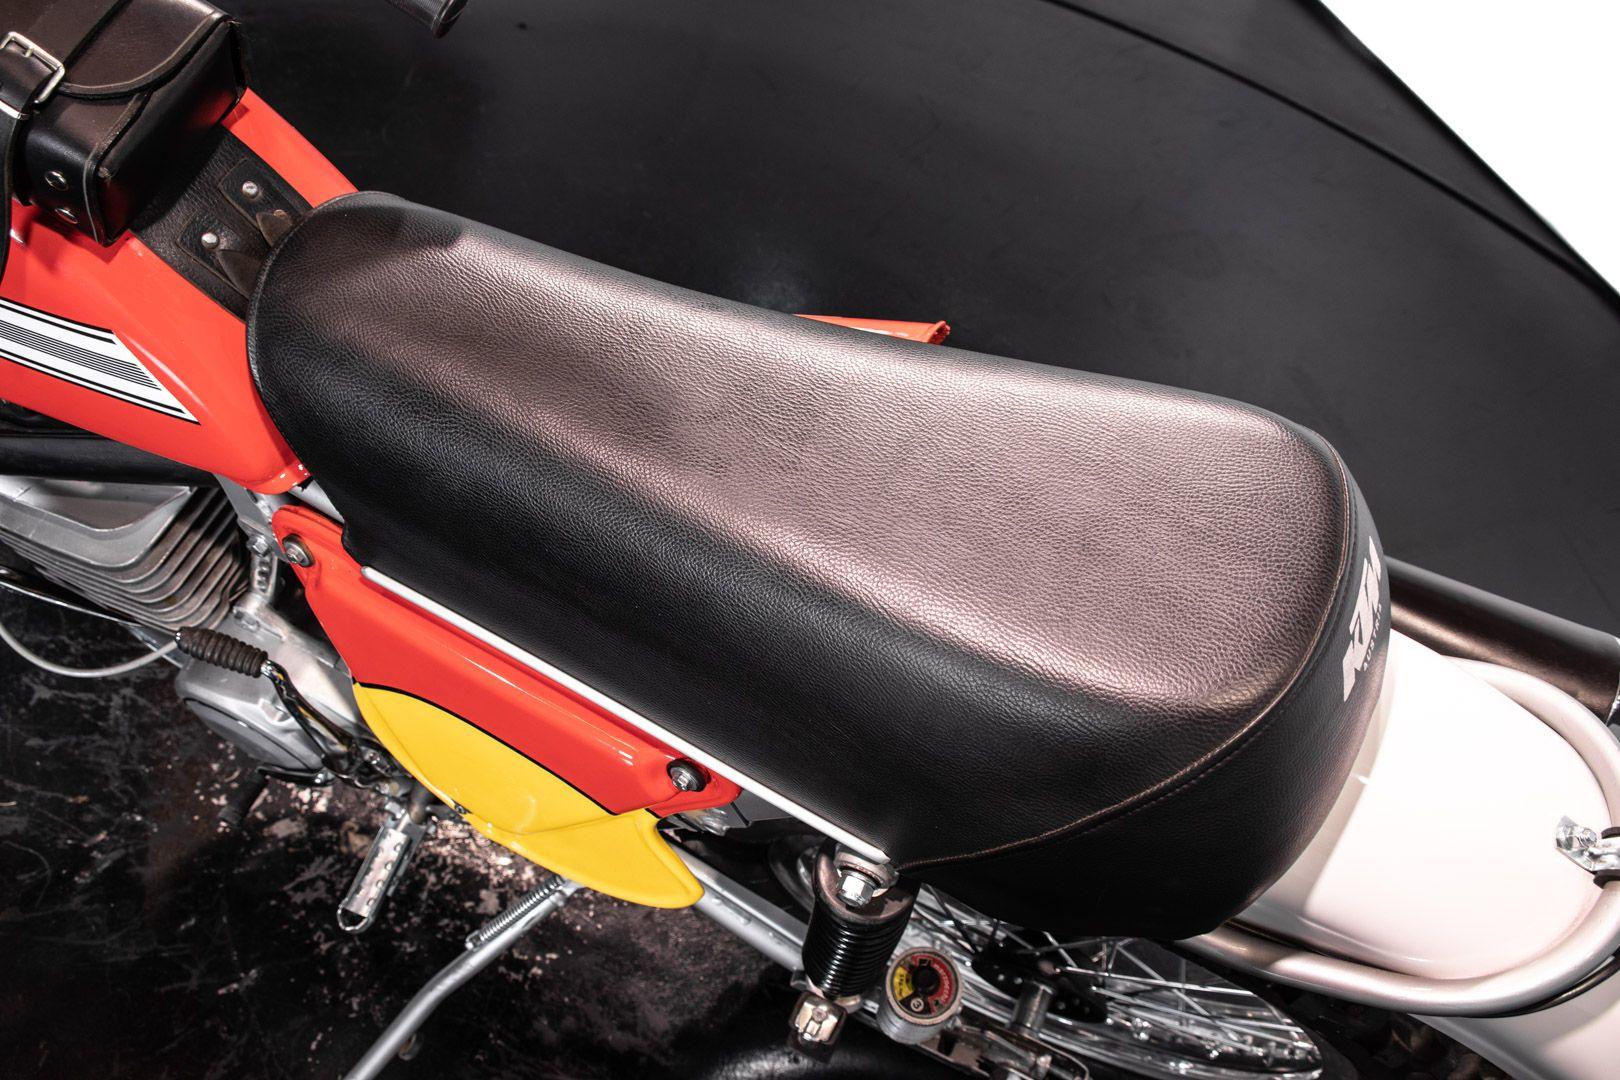 1976 KTM GS 250 84011